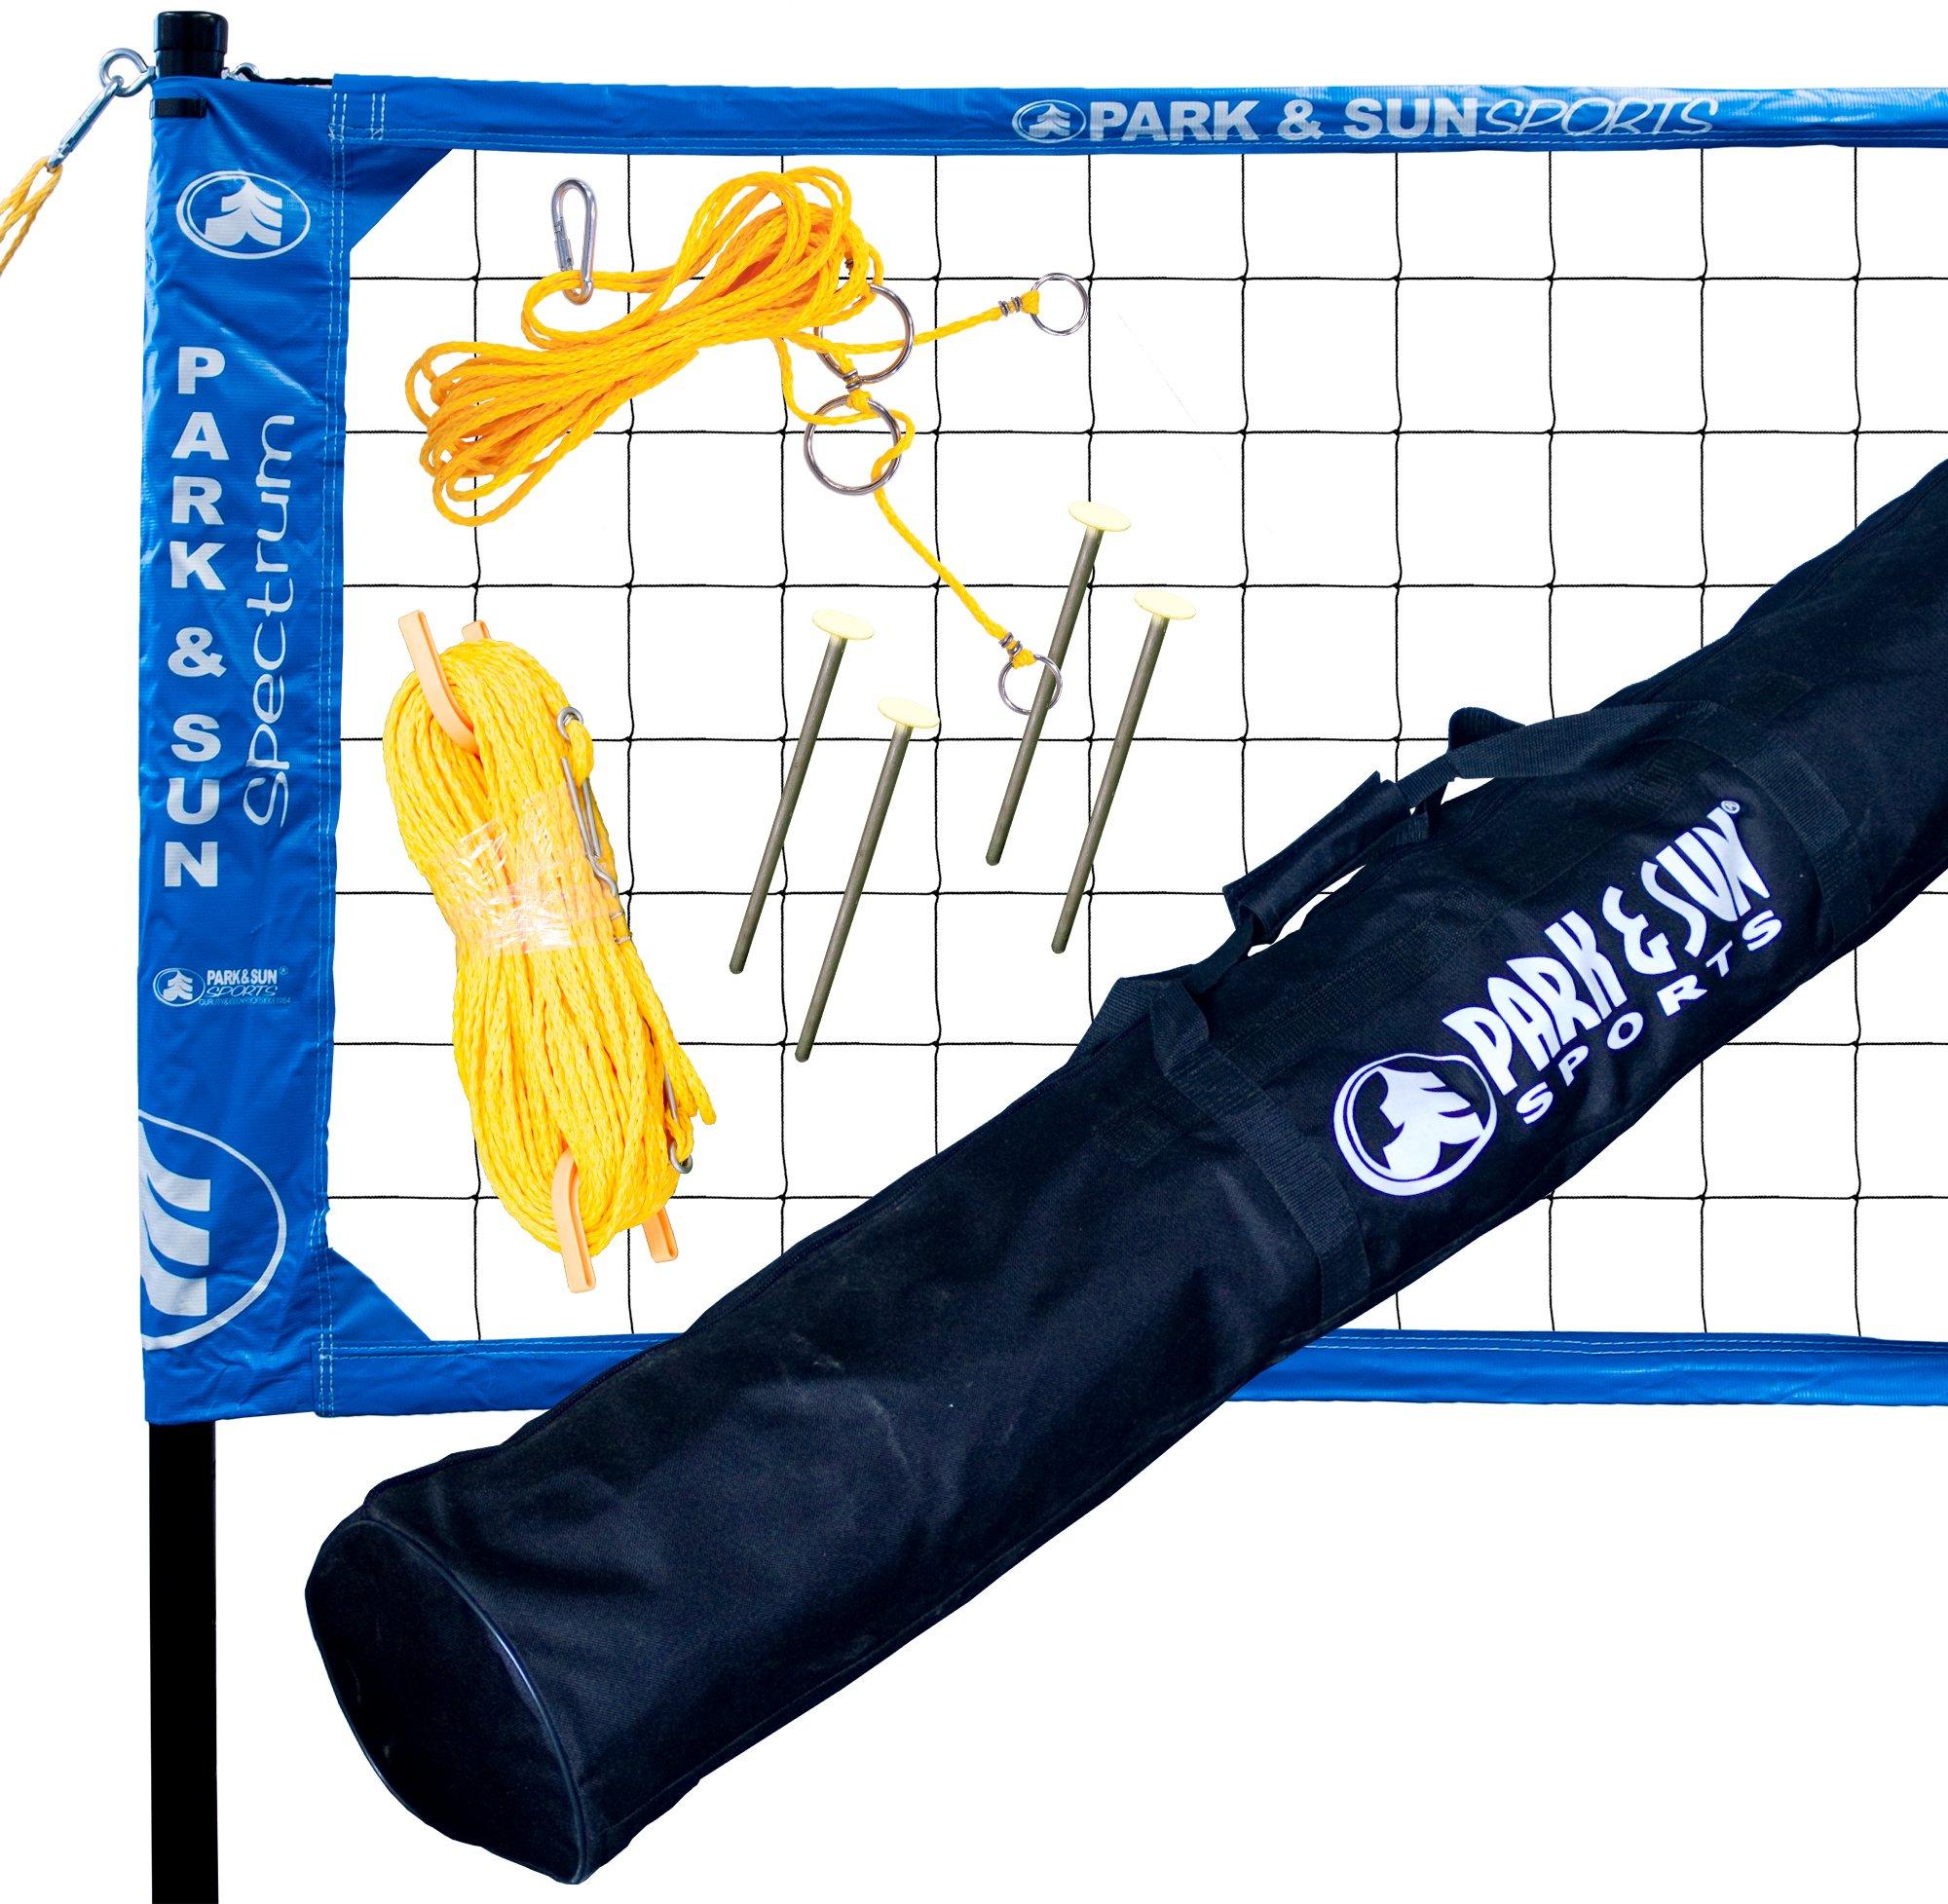 Park & Sun Sports Spectrum 2000: Portable